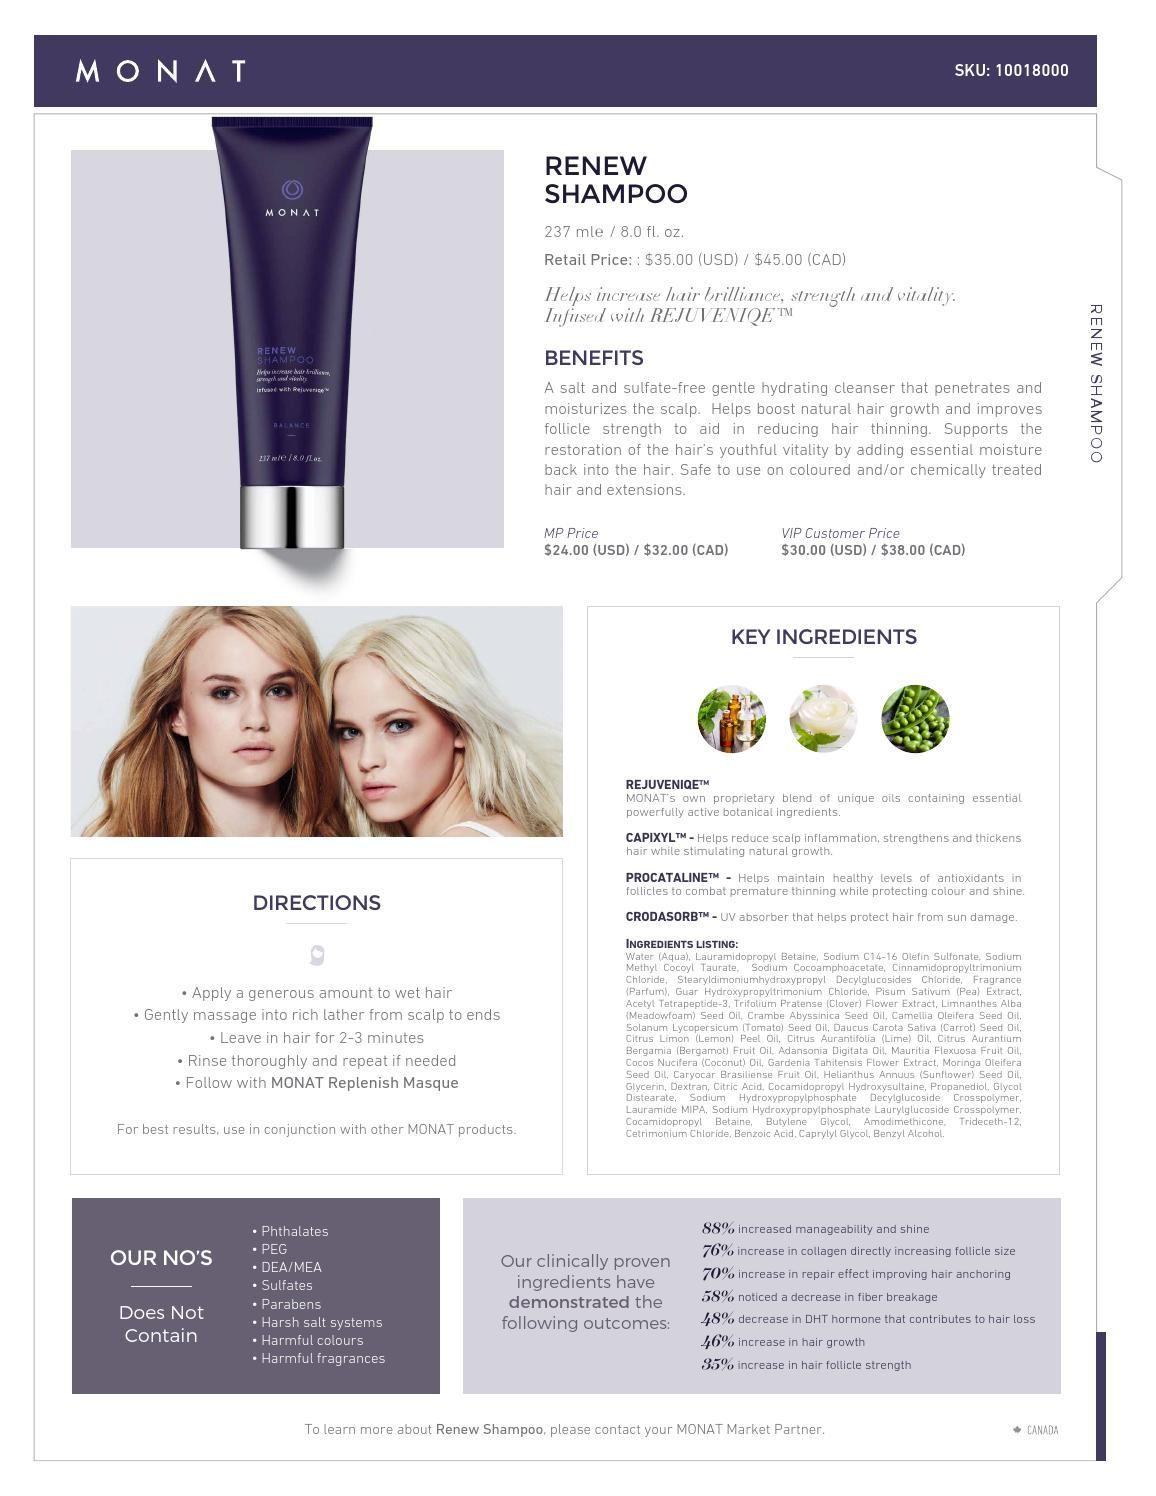 MONAT Renew Shampoo Infosheet Monat renew shampoo, Monat